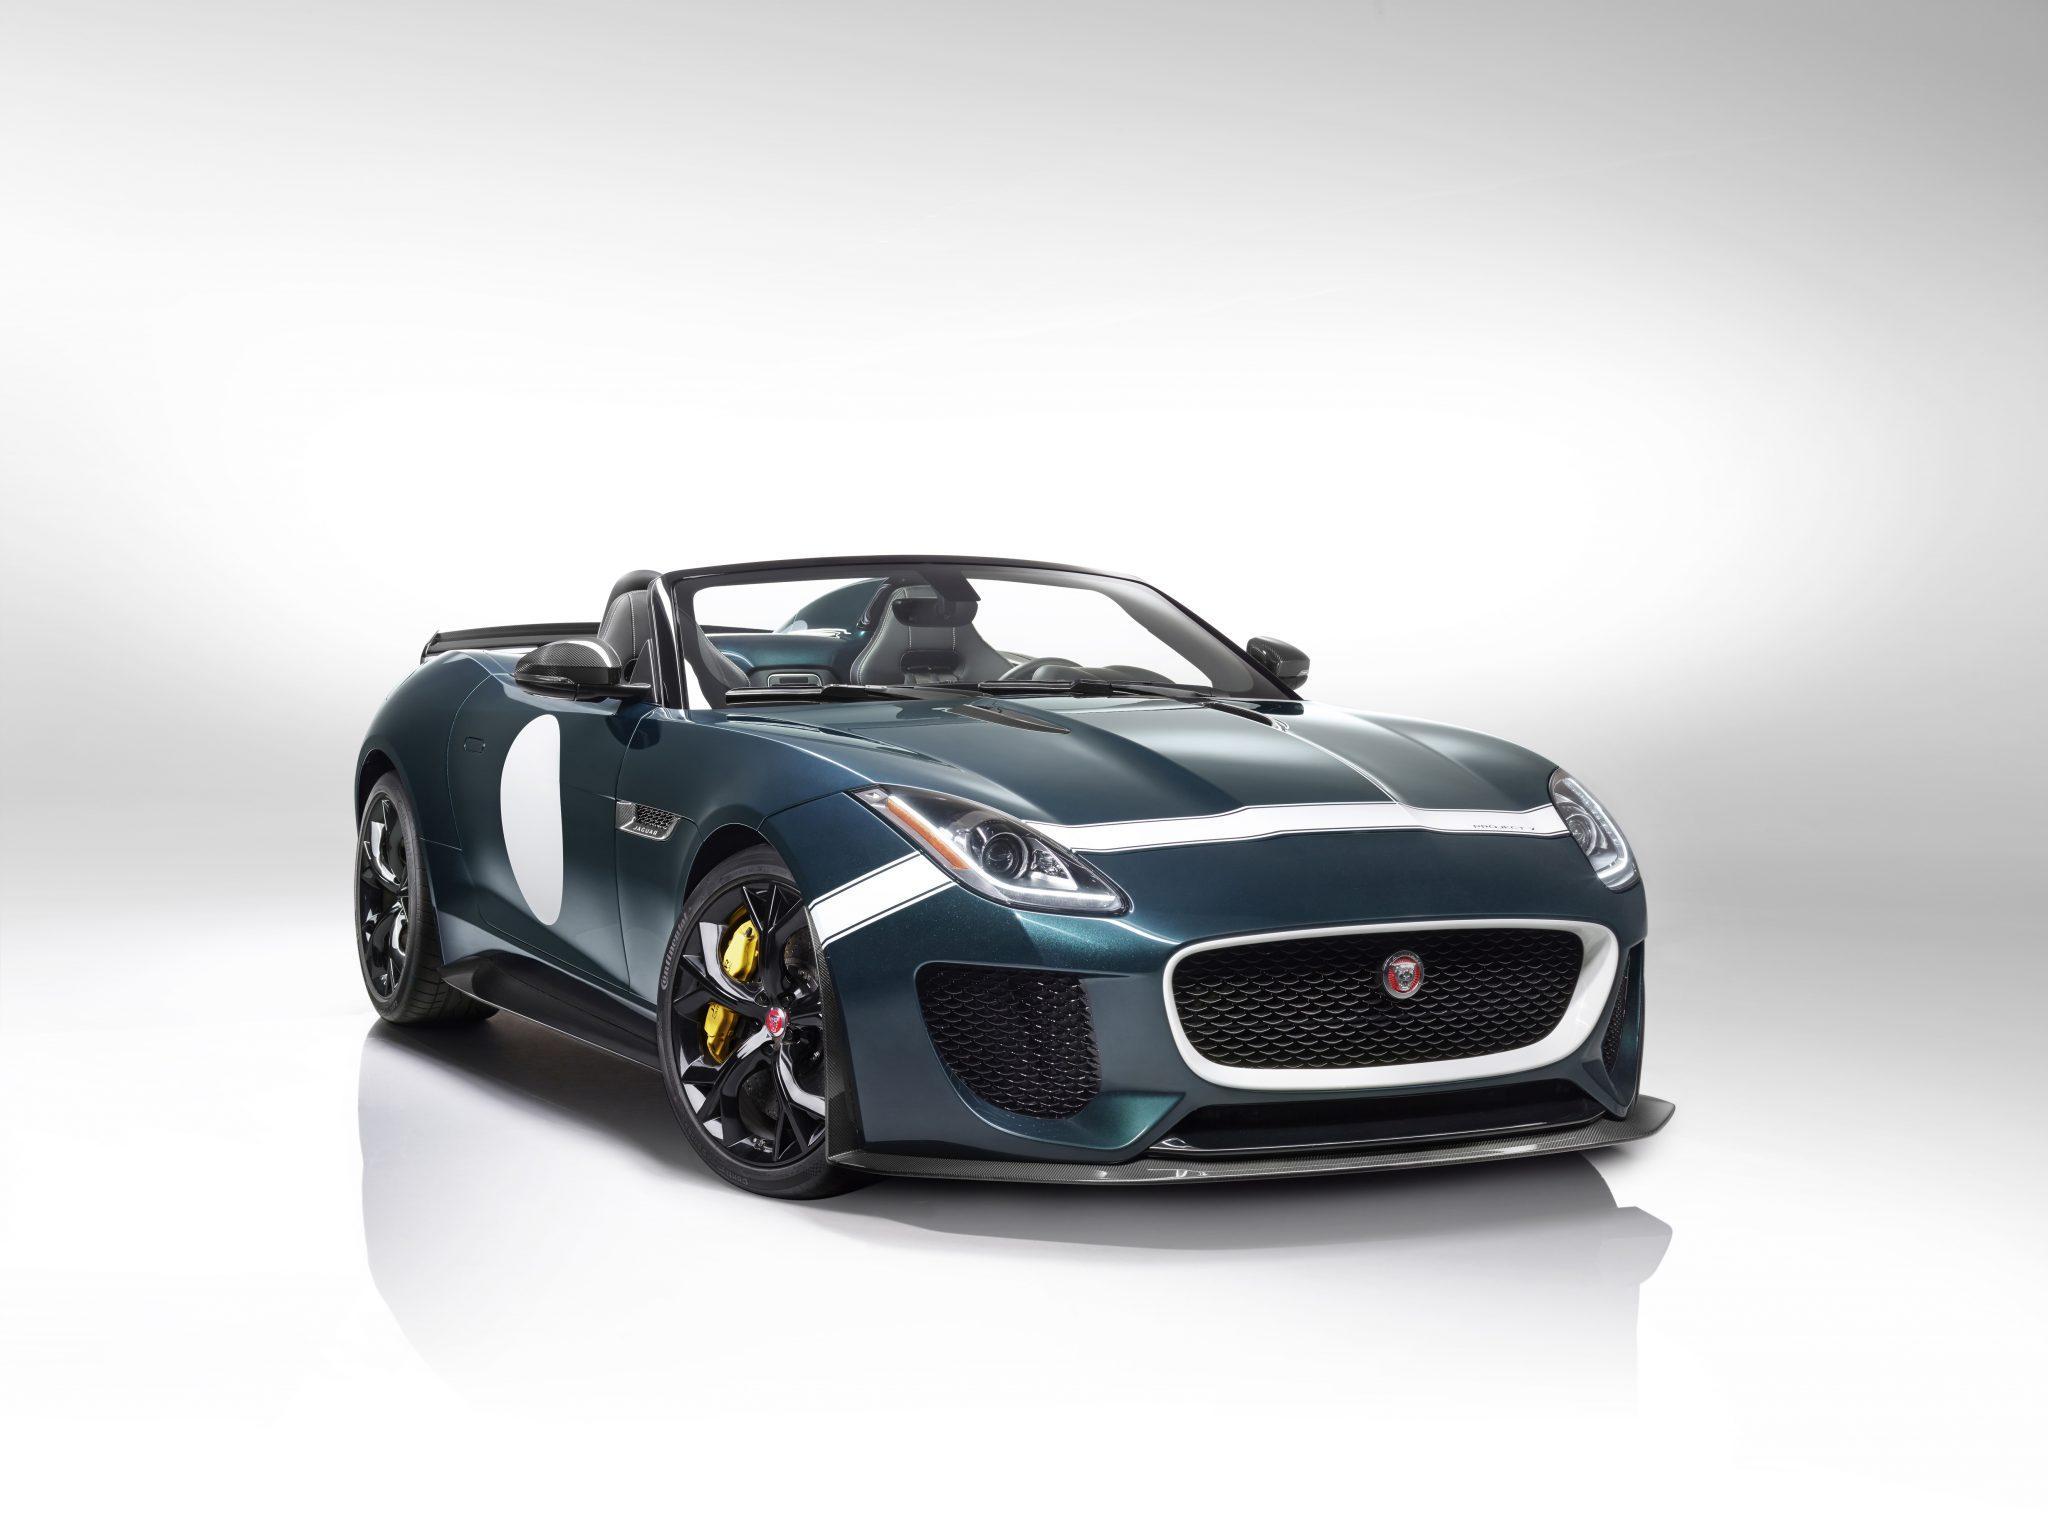 jaguar cars news f type project 7 confirmed for production. Black Bedroom Furniture Sets. Home Design Ideas